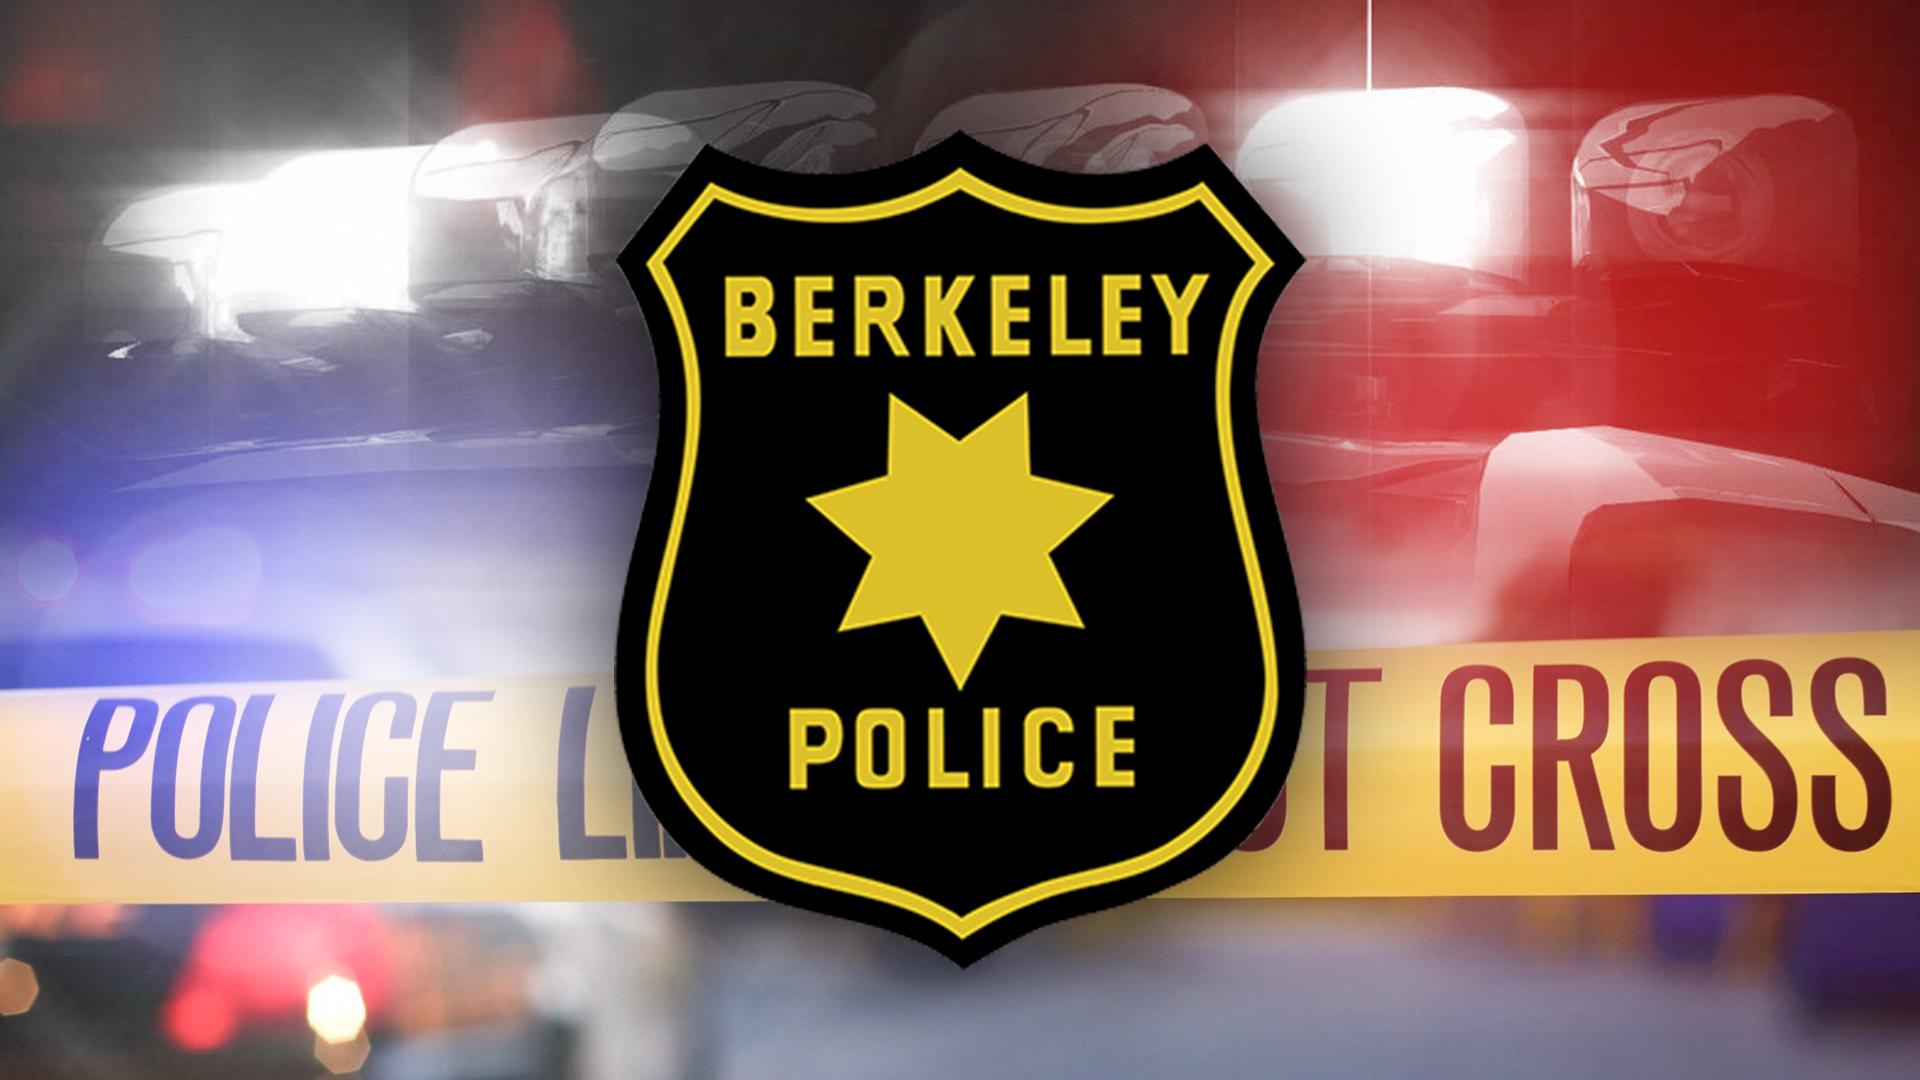 FS Police Berkeley_1553748596475.jpg.jpg